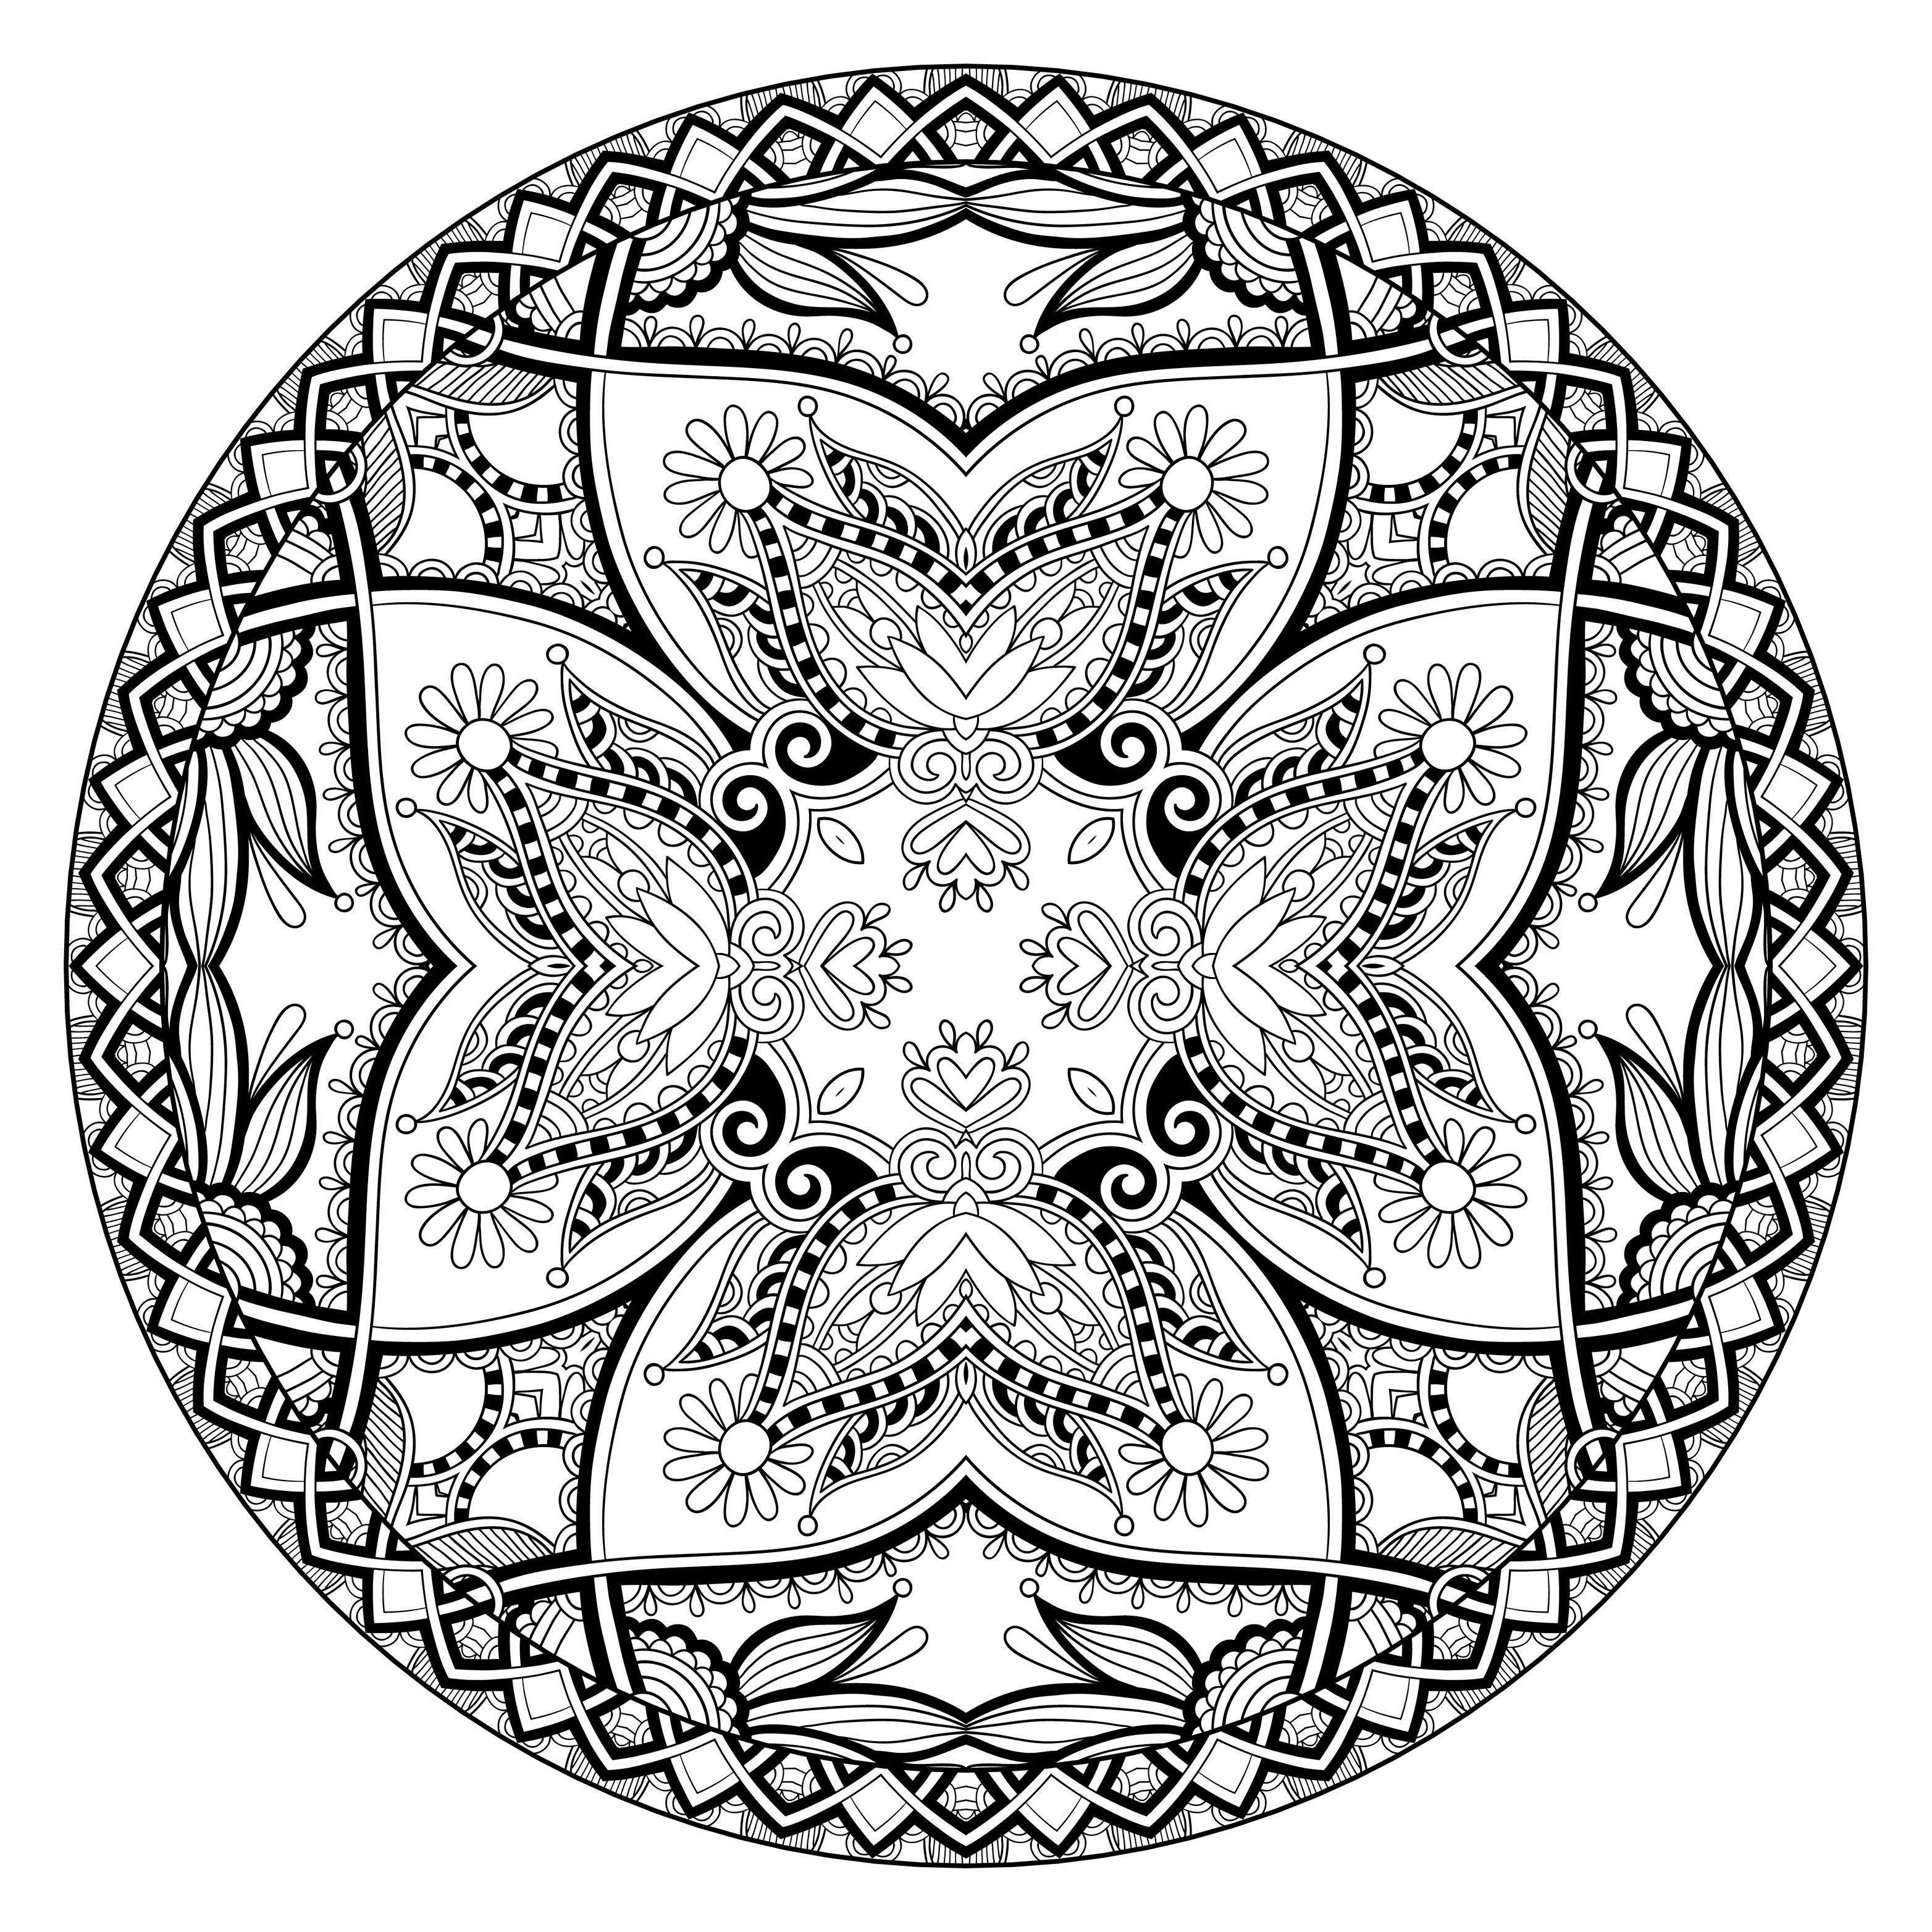 Mandala Calismasi Ornekleri